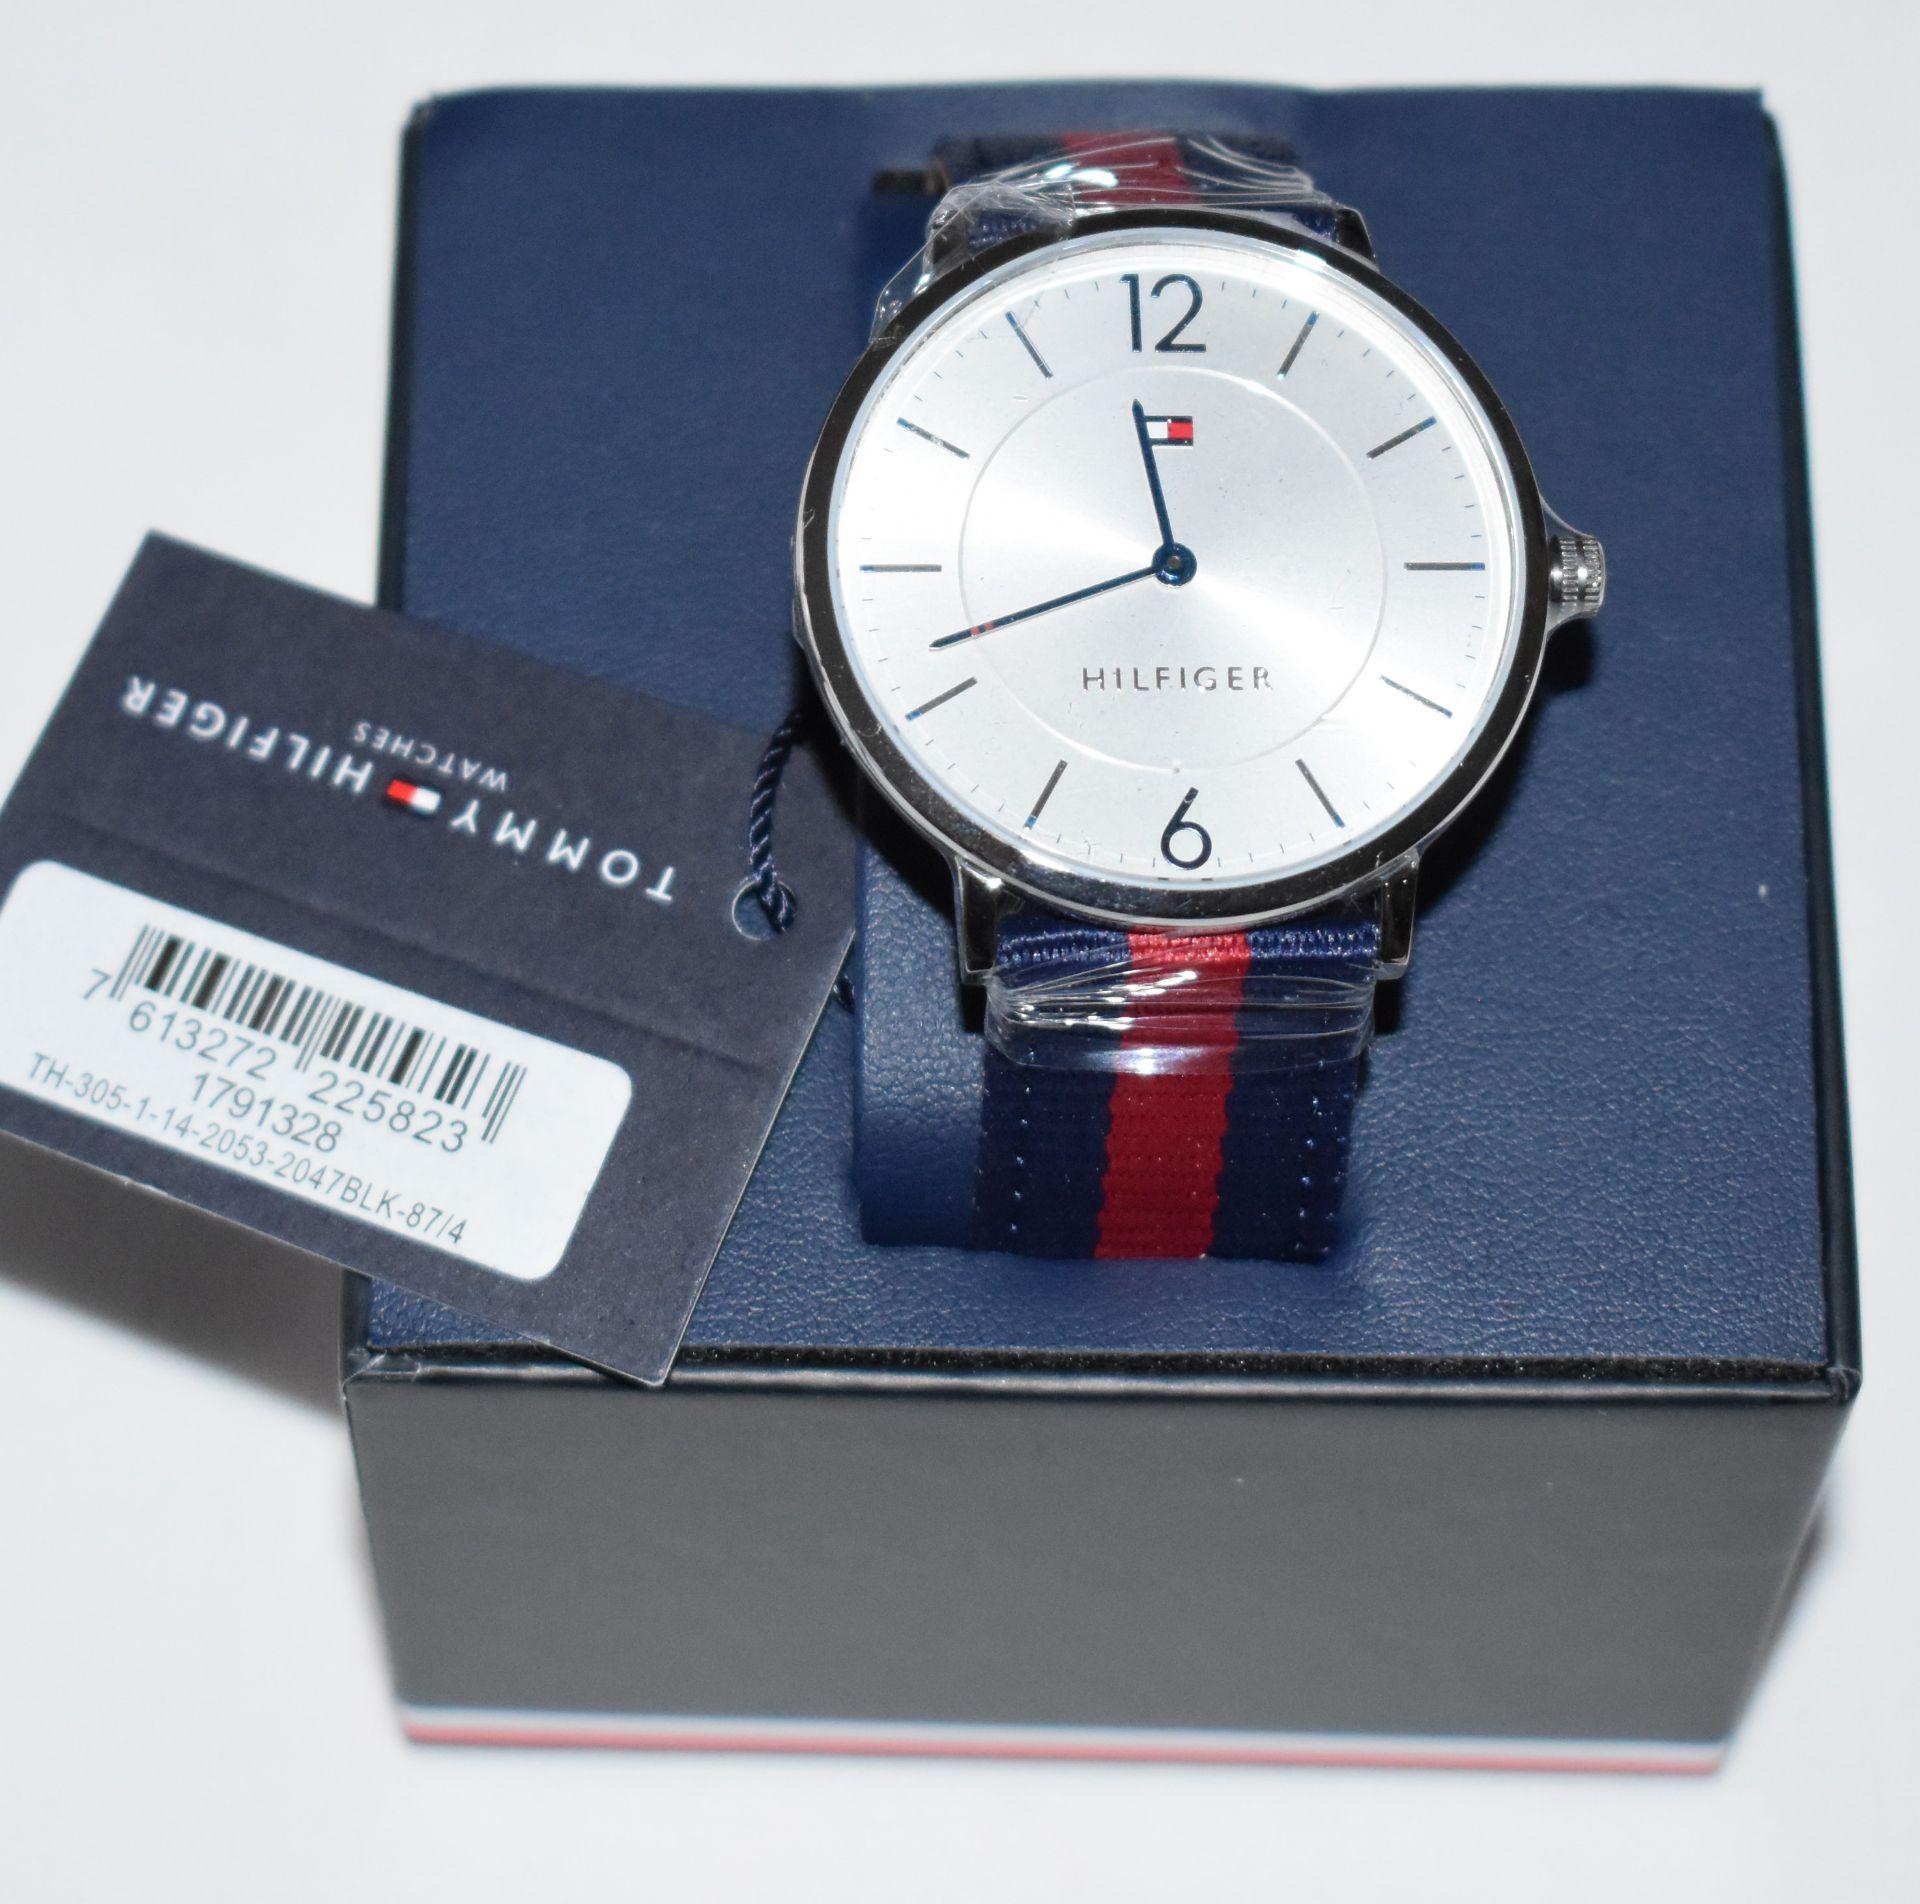 Tommy Hilfiger Men's Watch 1791328 - Image 2 of 2